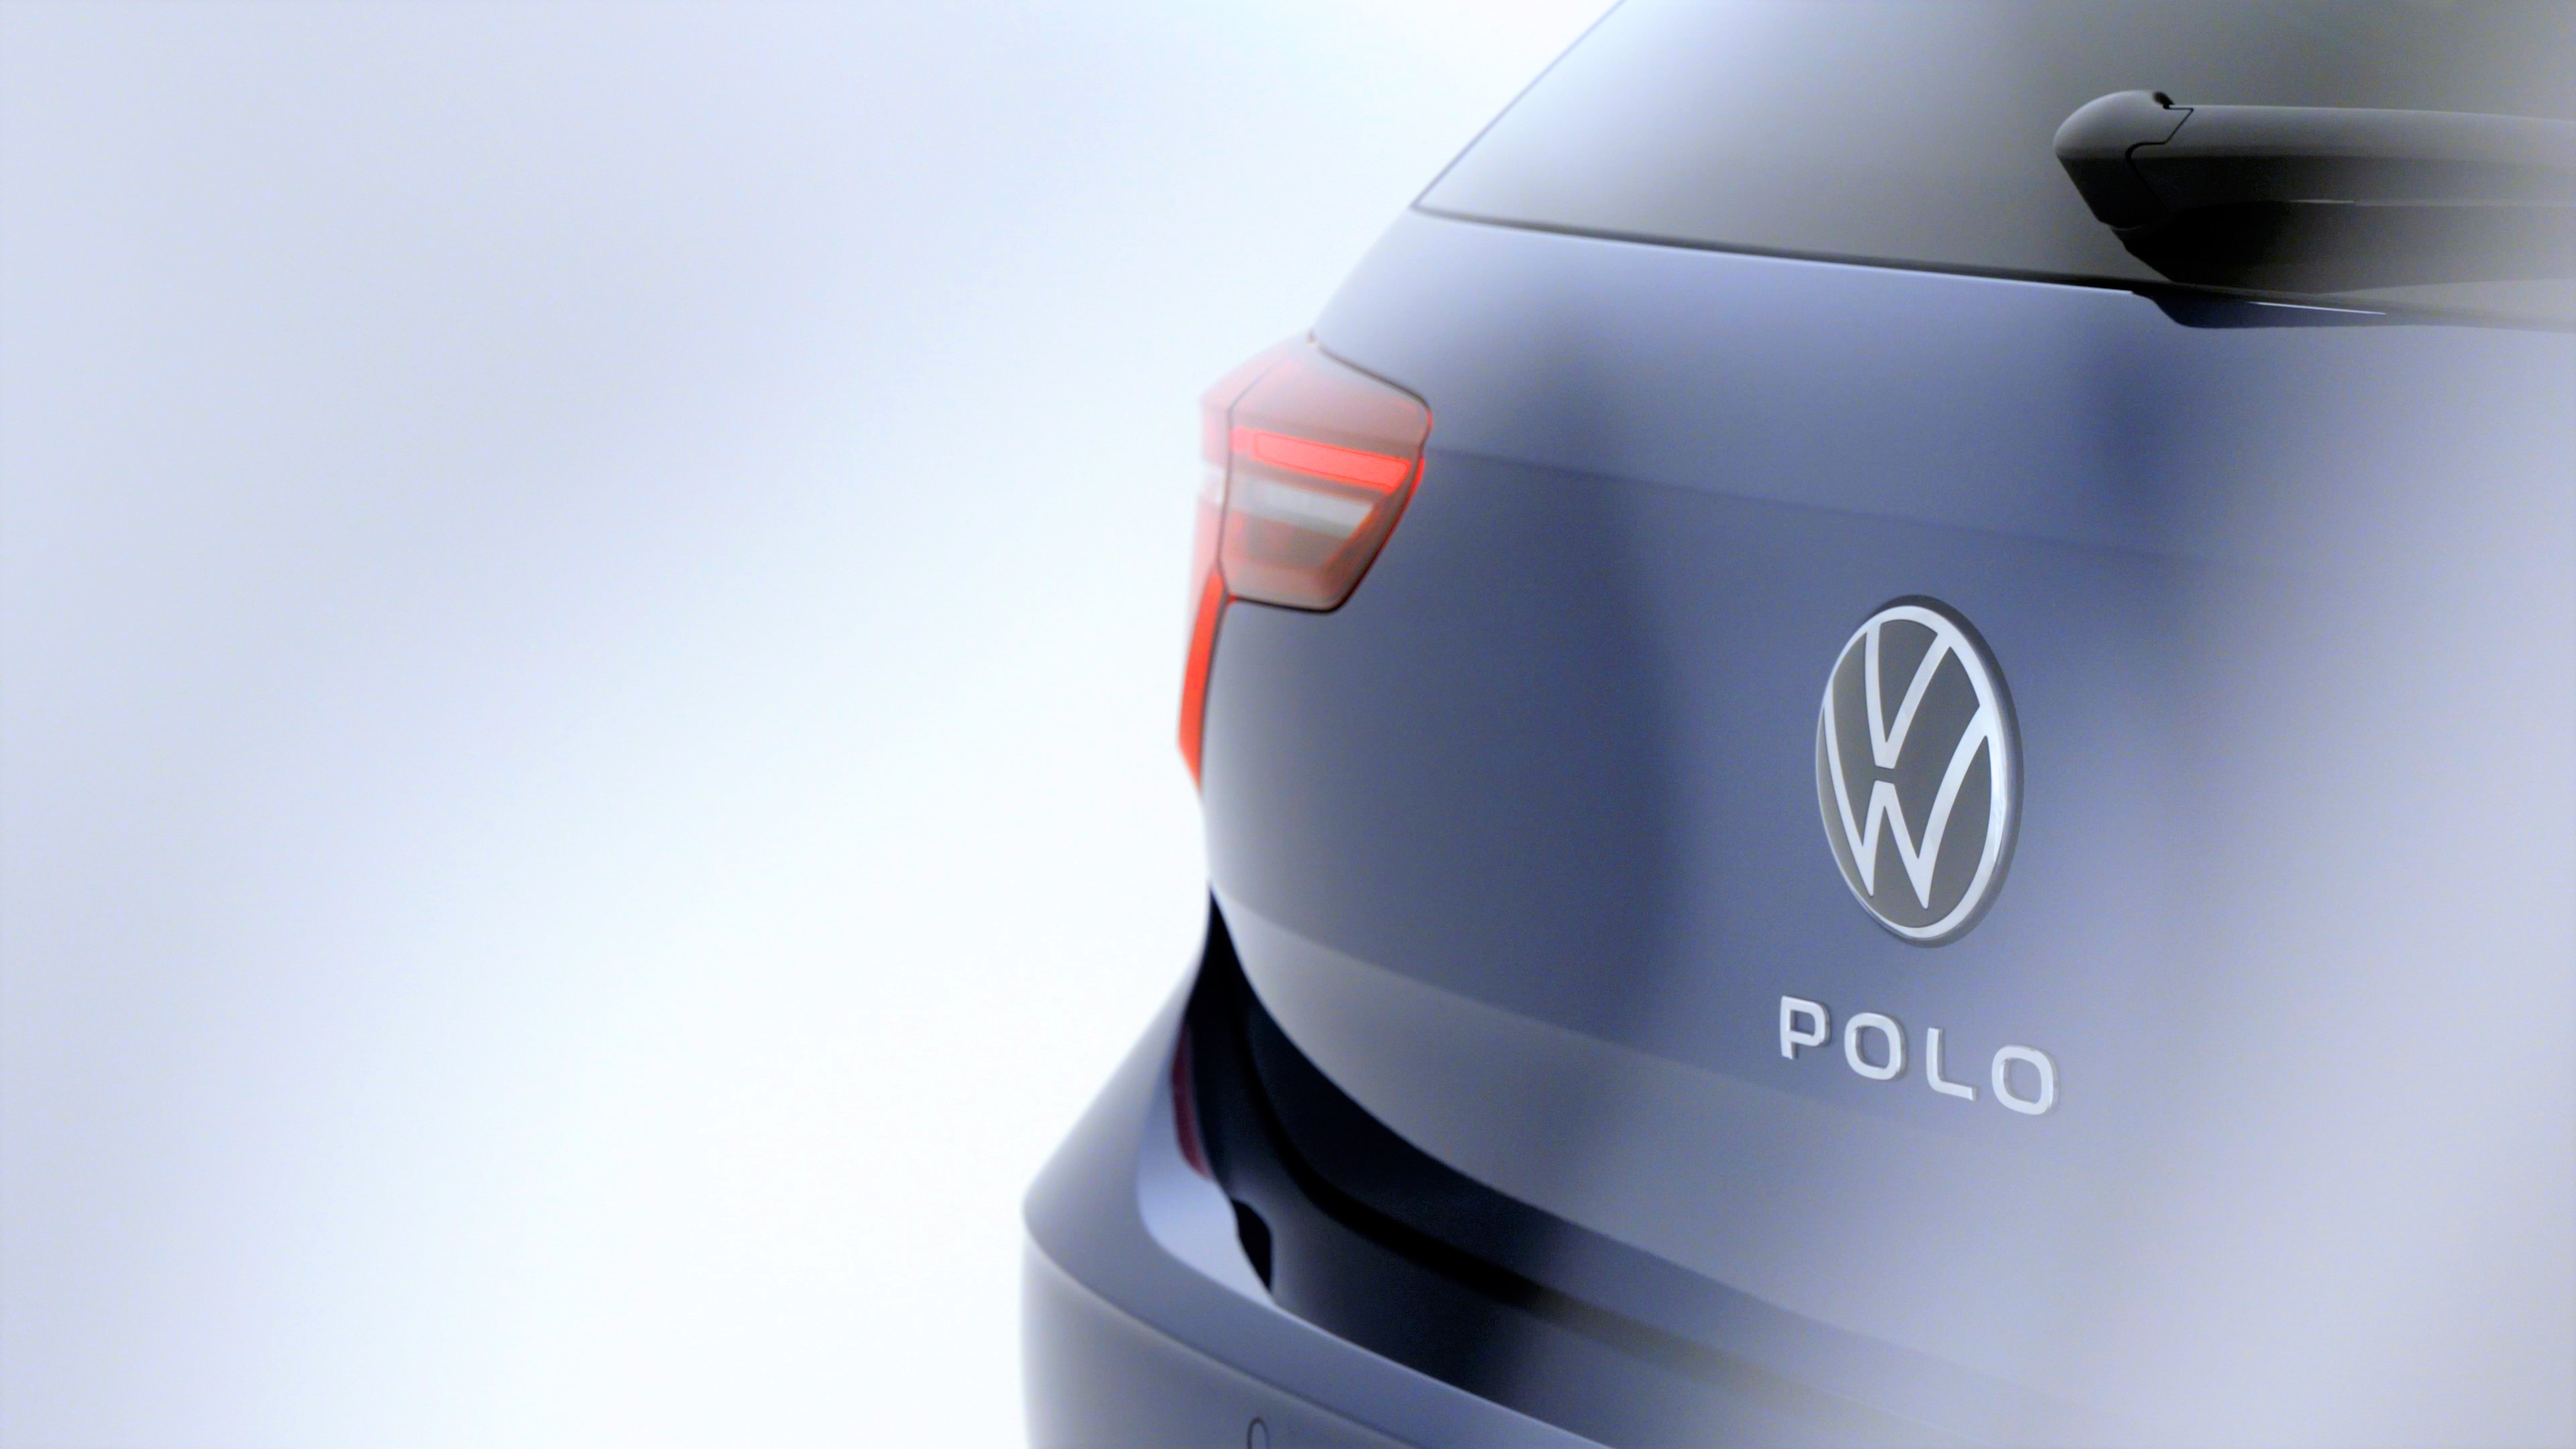 Polo_FL_Footage-UHD.00_11_41_22.Standbild005.jpg